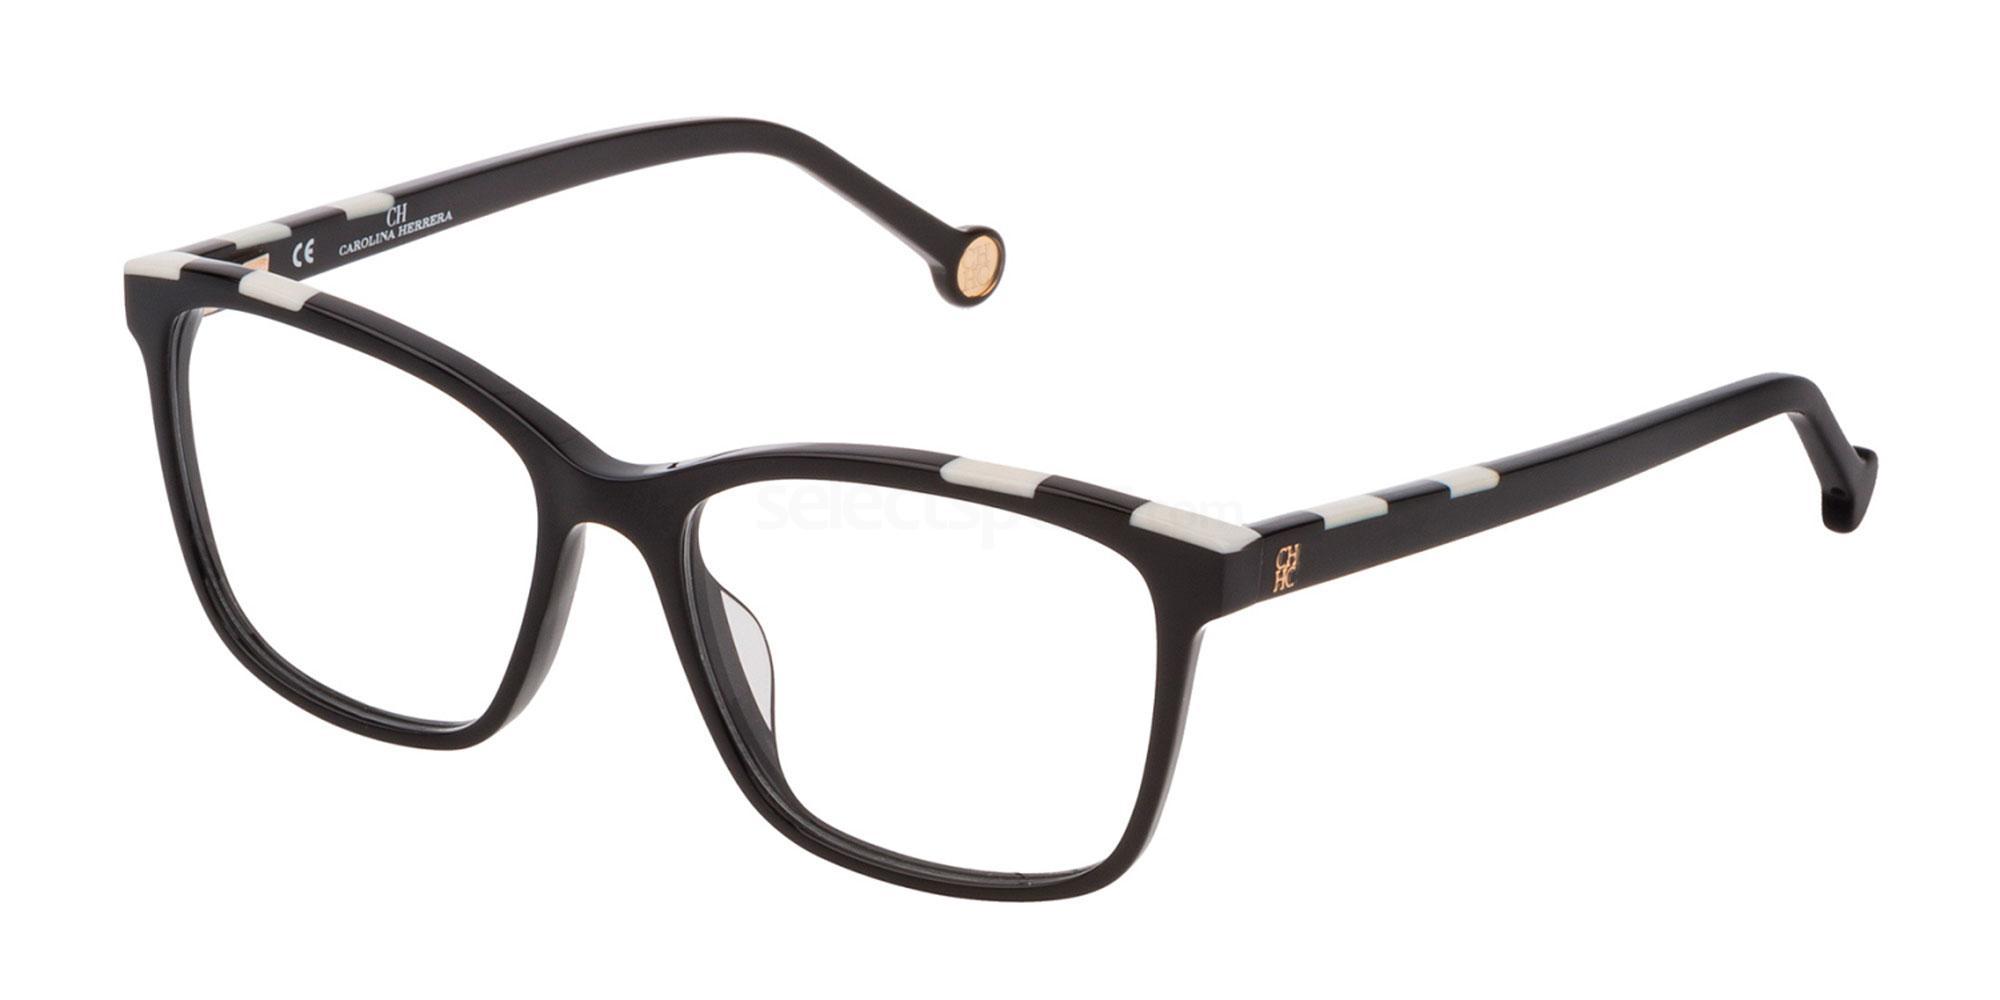 0700 VHE803 Glasses, CH Carolina Herrera